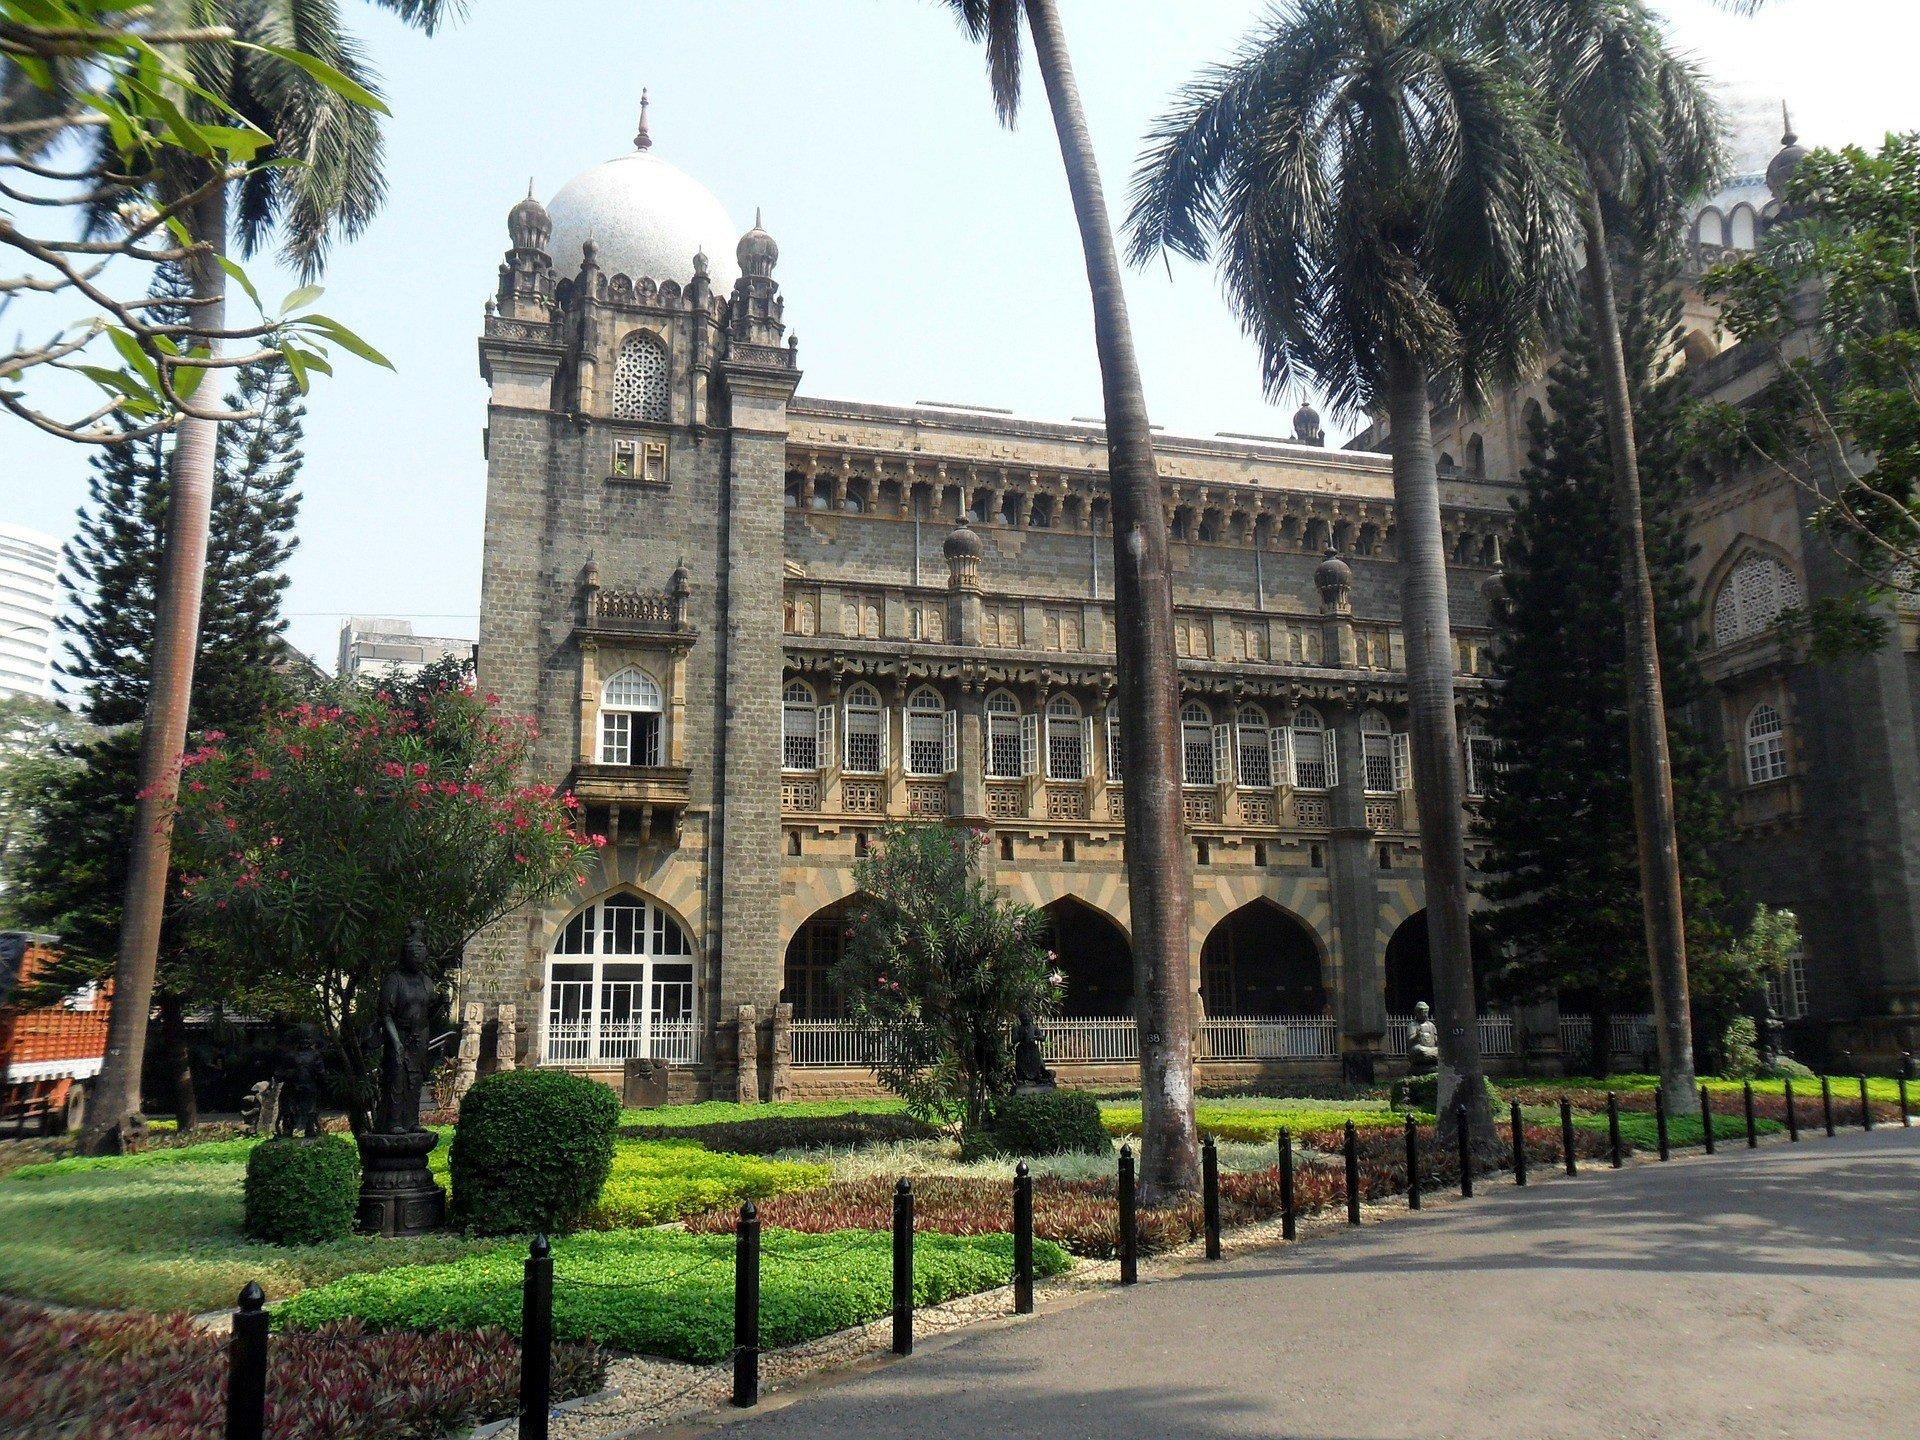 Chhatrapati Shivaji Maharaj Vastu Sangrahalaya in Mumbai